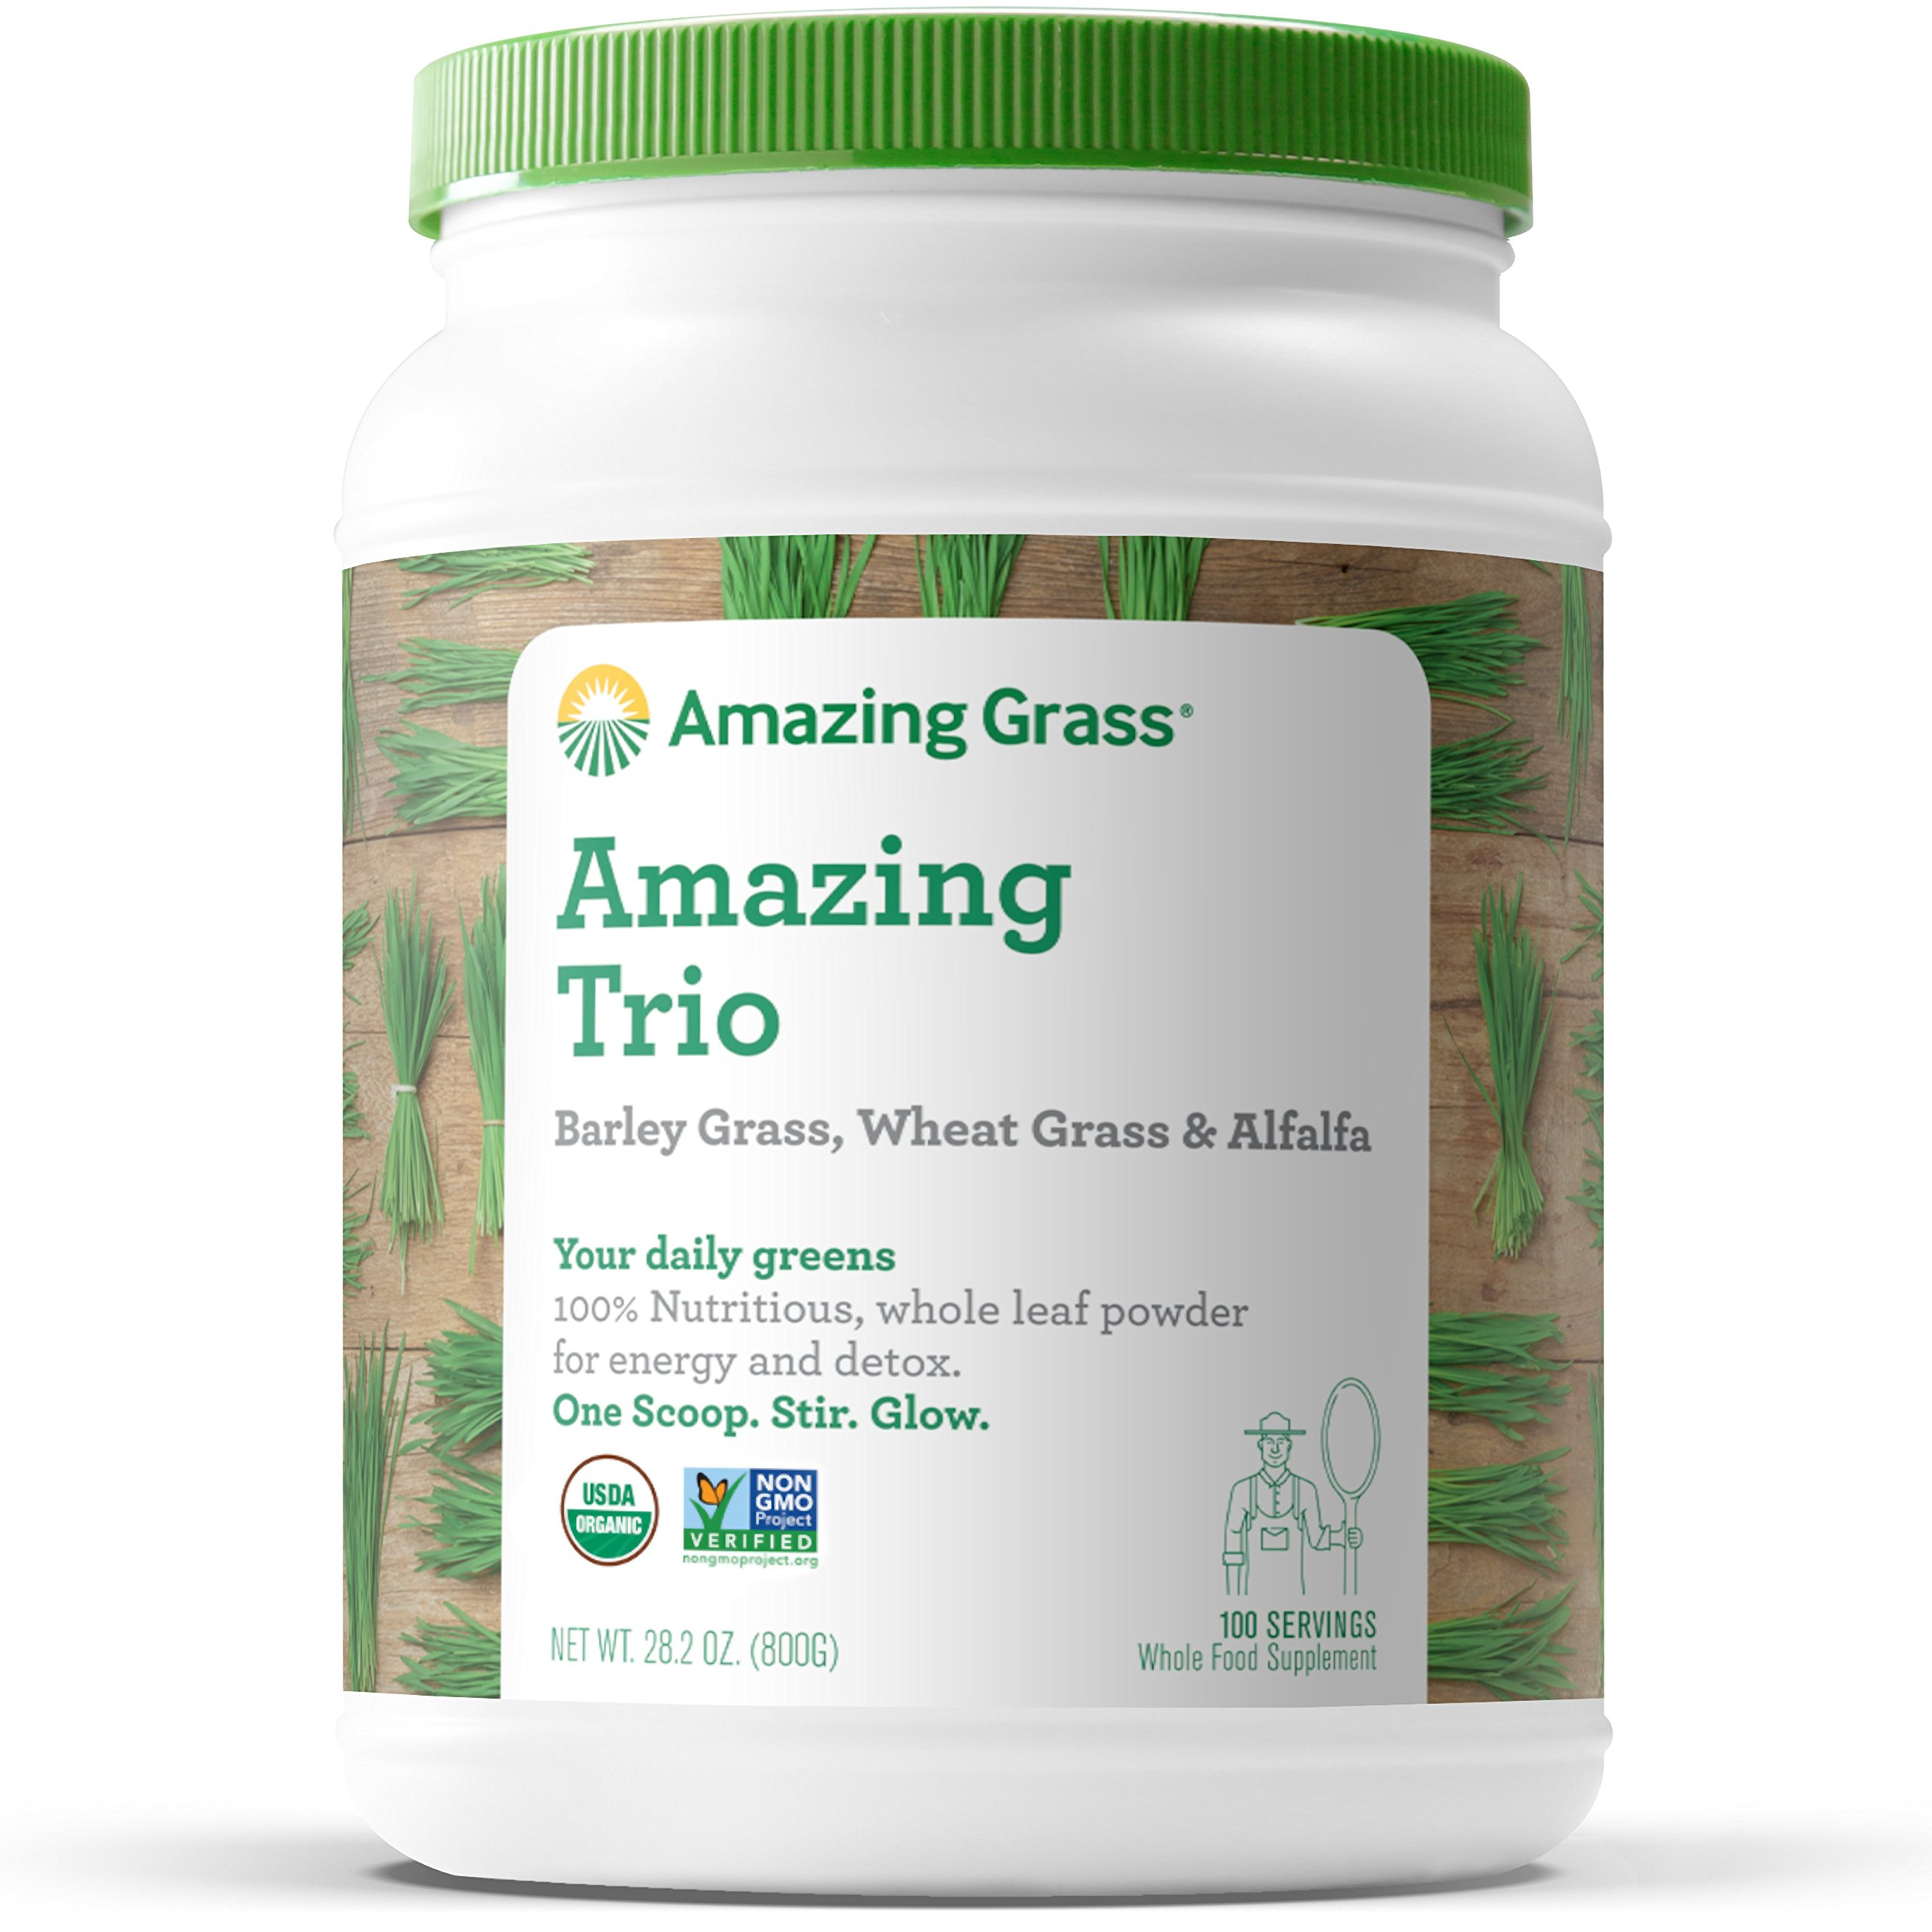 Amazing Grass Amazing Trio: Organic Greens Powder with Wheatgrass, Barley Grass and Alfalfa, 2 Servings of Greens per Scoop, 100 Servings by Amazing Grass